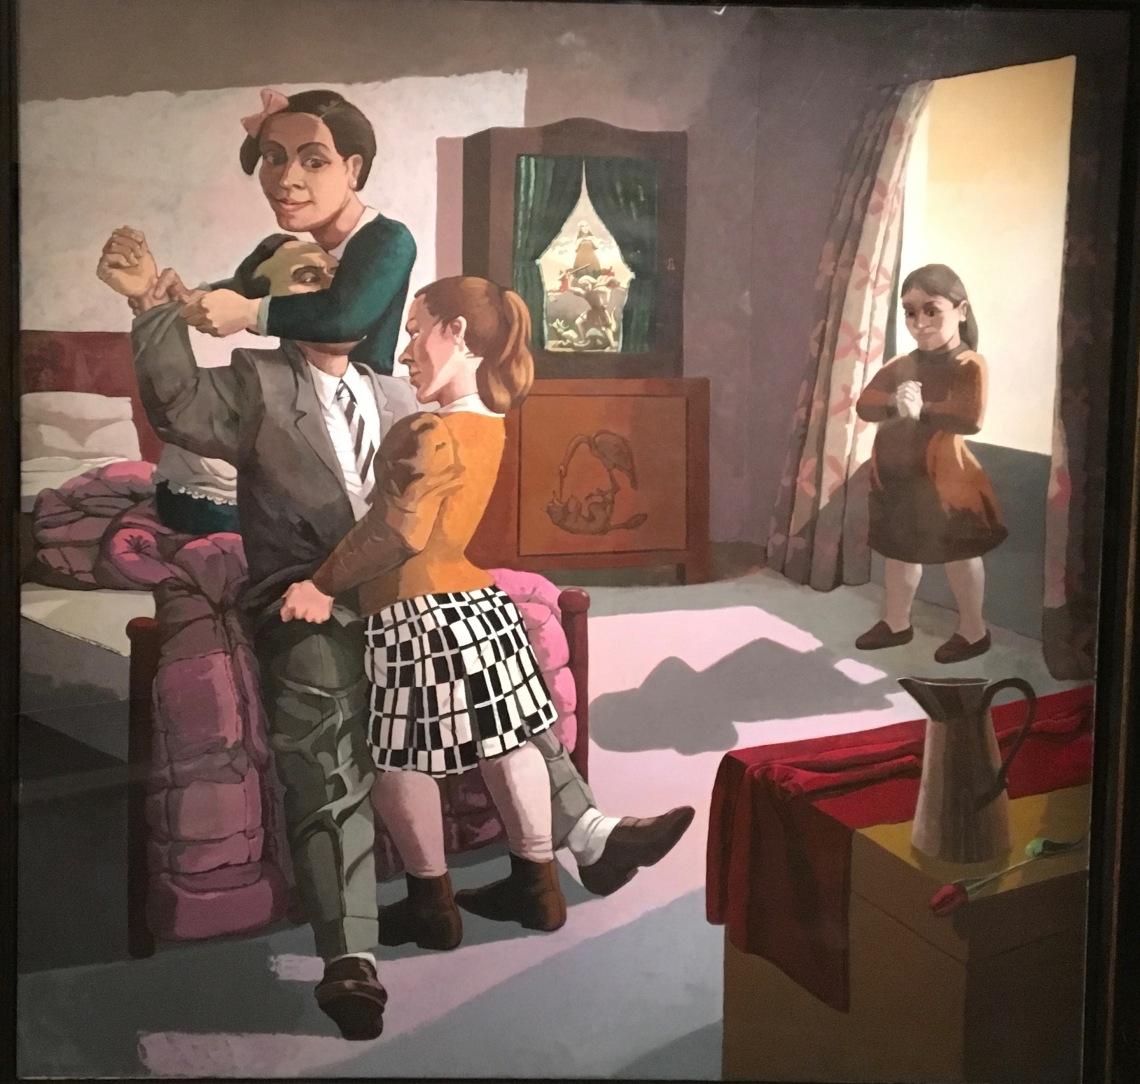 4. Paula Rego, The Family, 1988, acrylique monté su toile. Marlborough International Fine Art